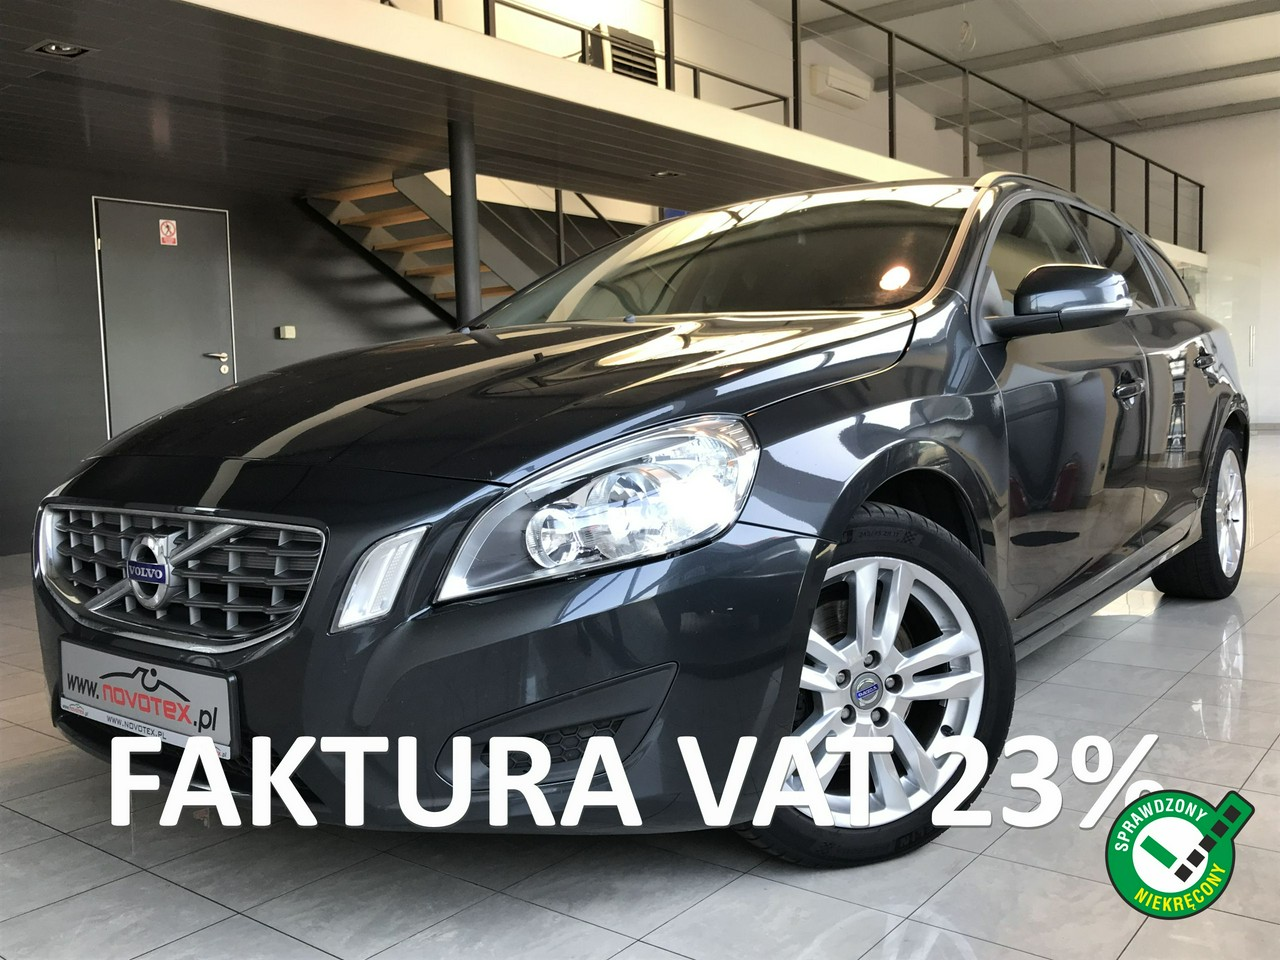 Volvo V60 D2*Momentum*navi*ALU 17*nowe opony*serwis w ASO Volvo*Gwarancja VIP